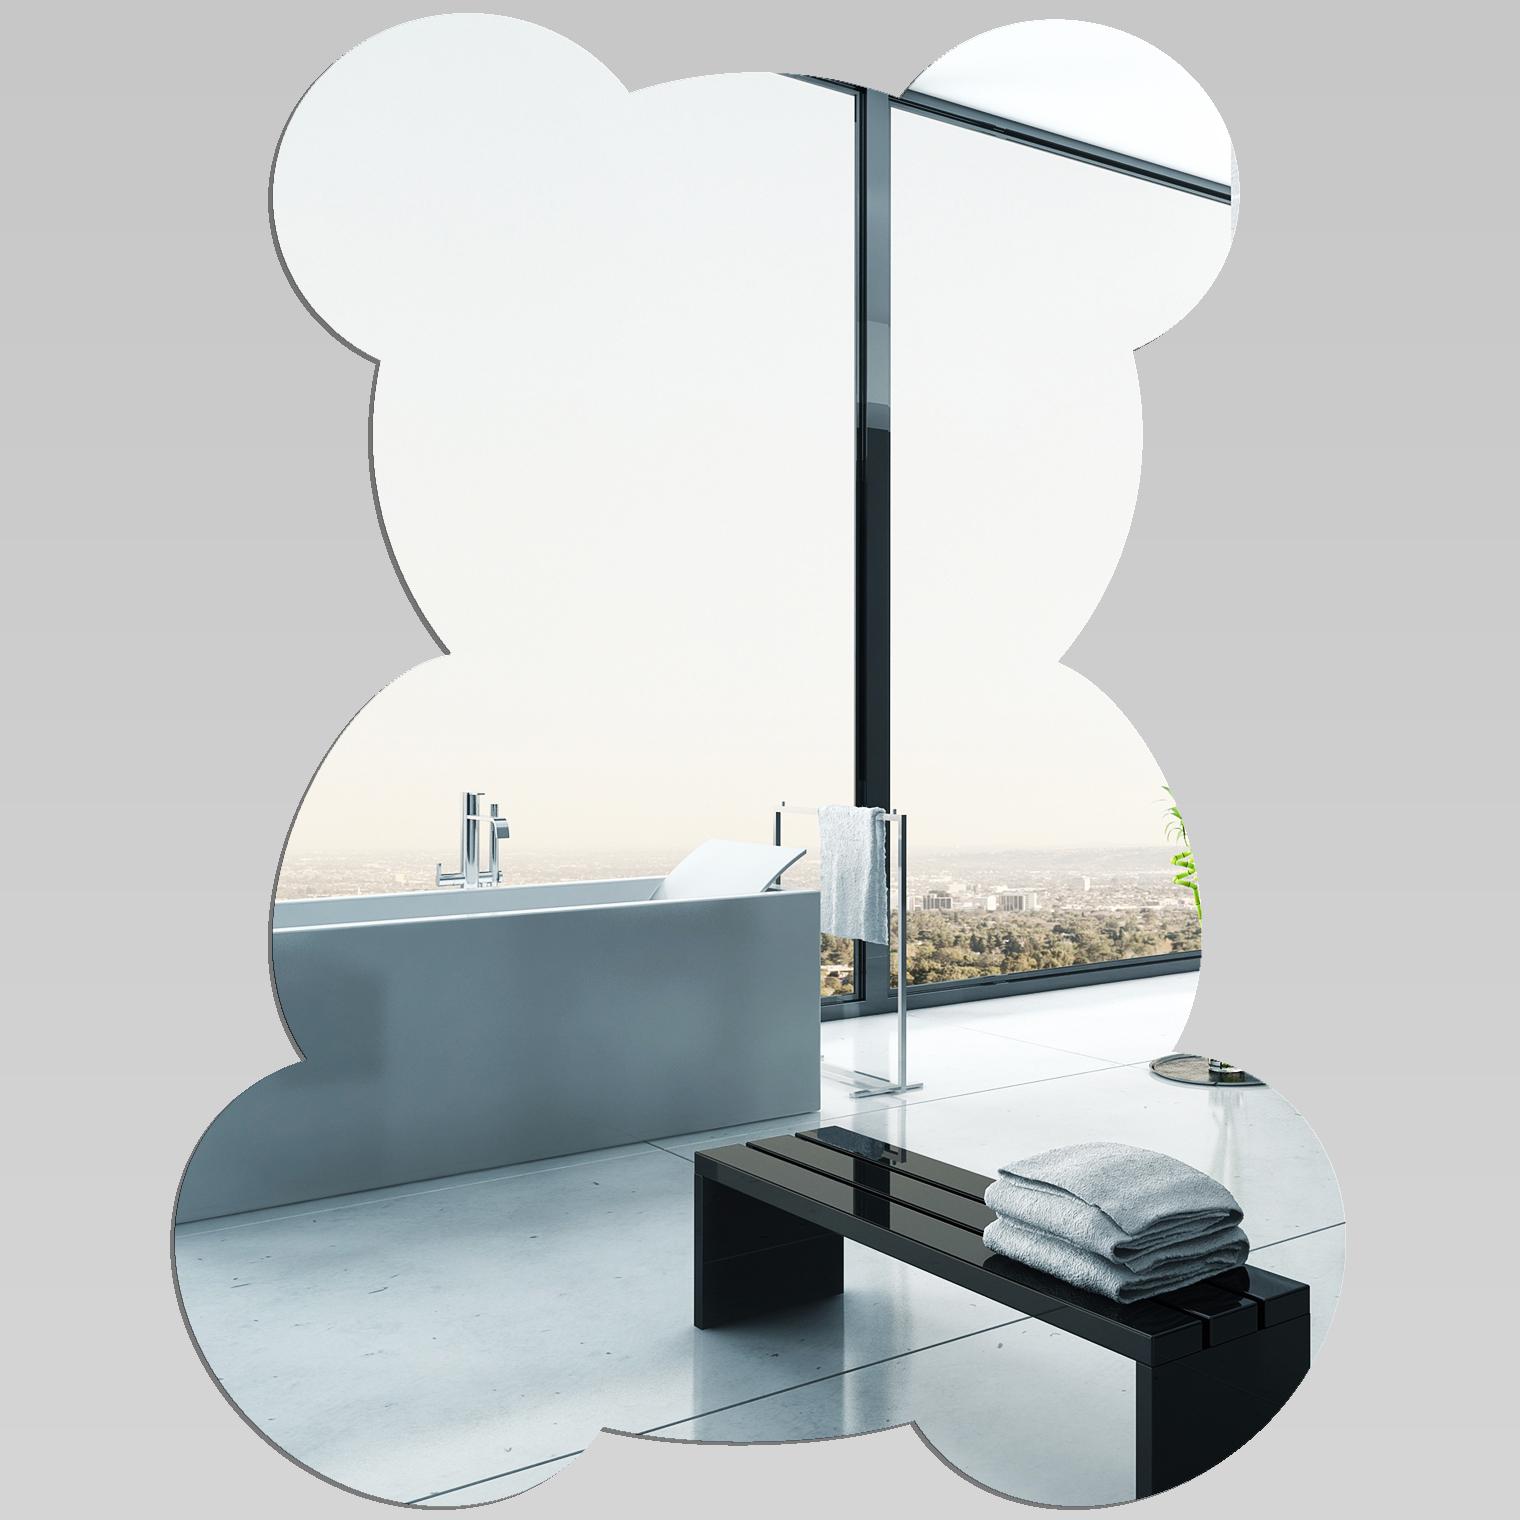 Miroir plexiglass acrylique b b ourson pas cher for Miroir acrylique incassable